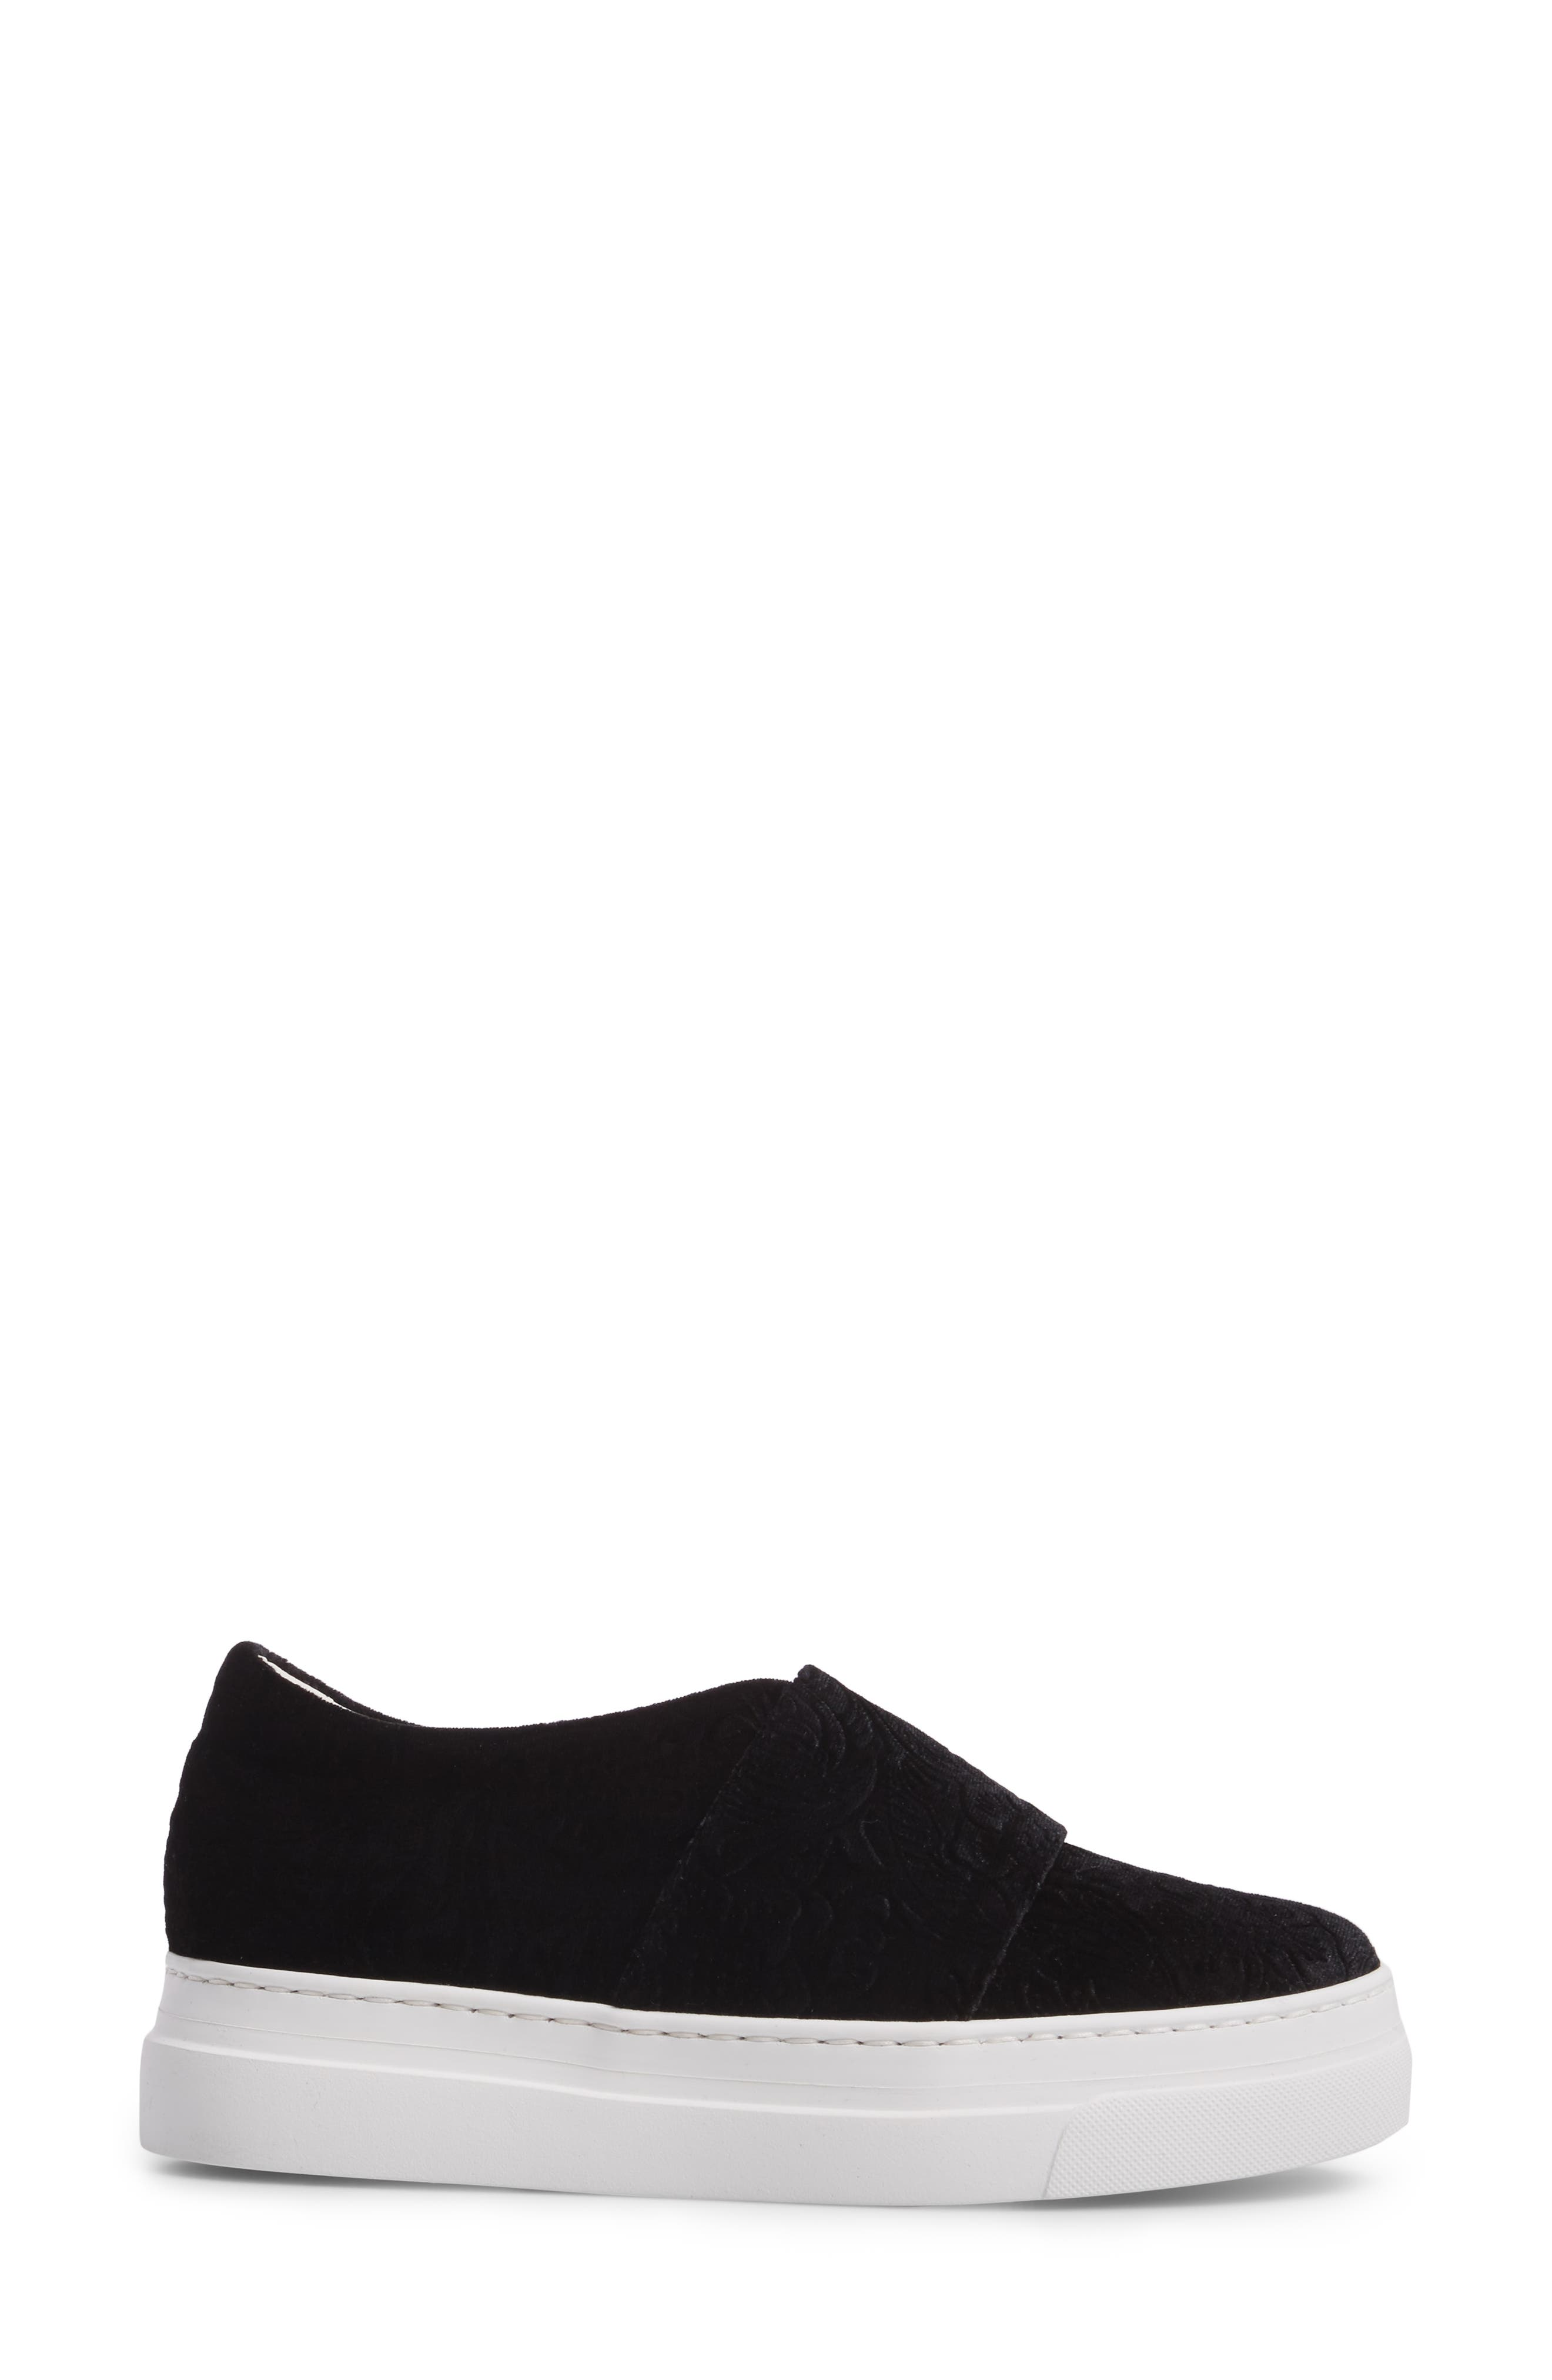 Alternate Image 3  - Lewit Arlo Slip-On Platform Sneaker (Women)